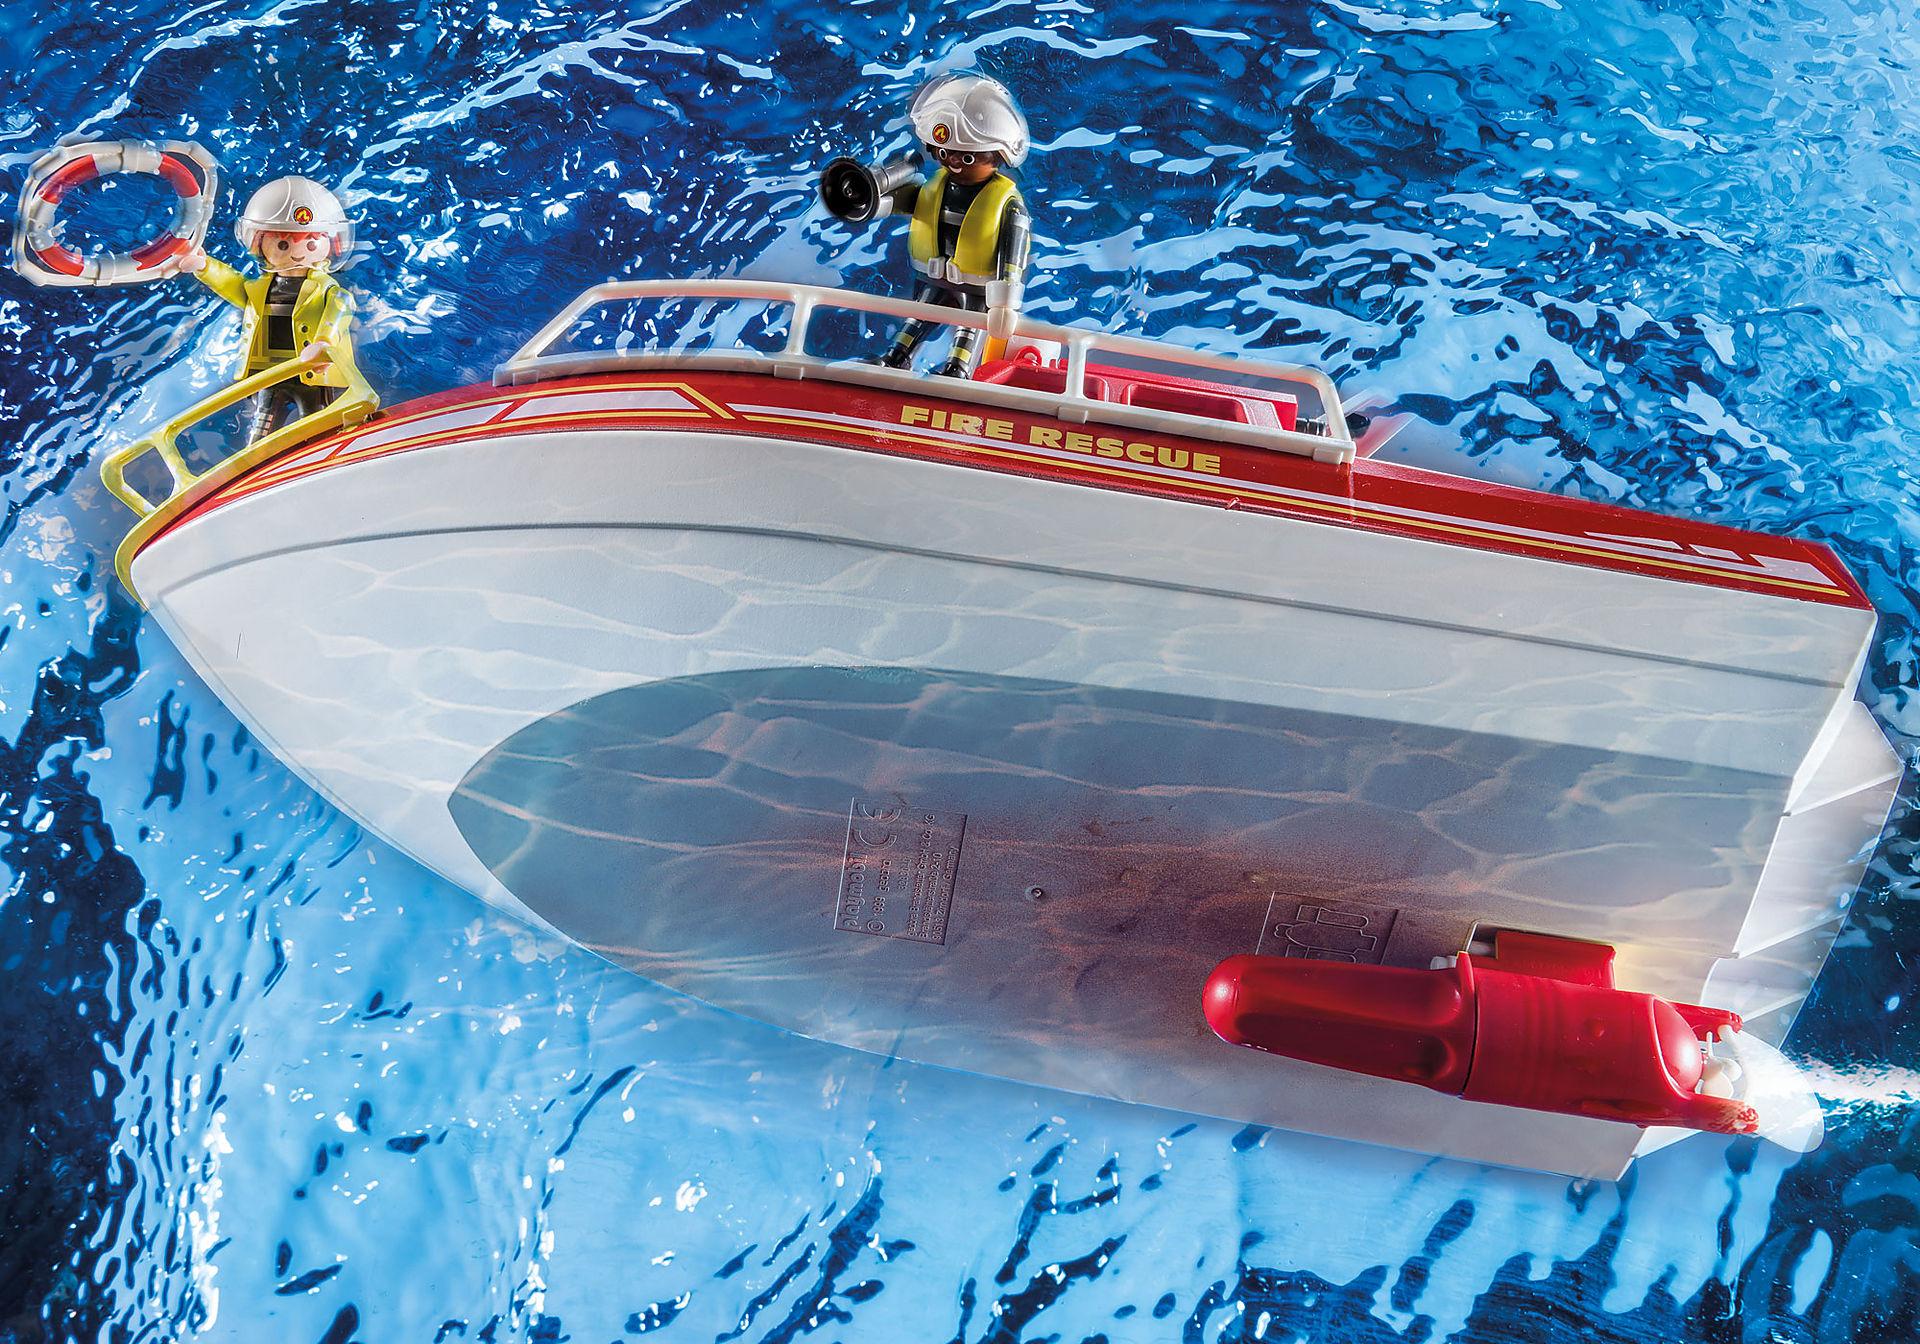 70147 Brandräddningsbåt zoom image6